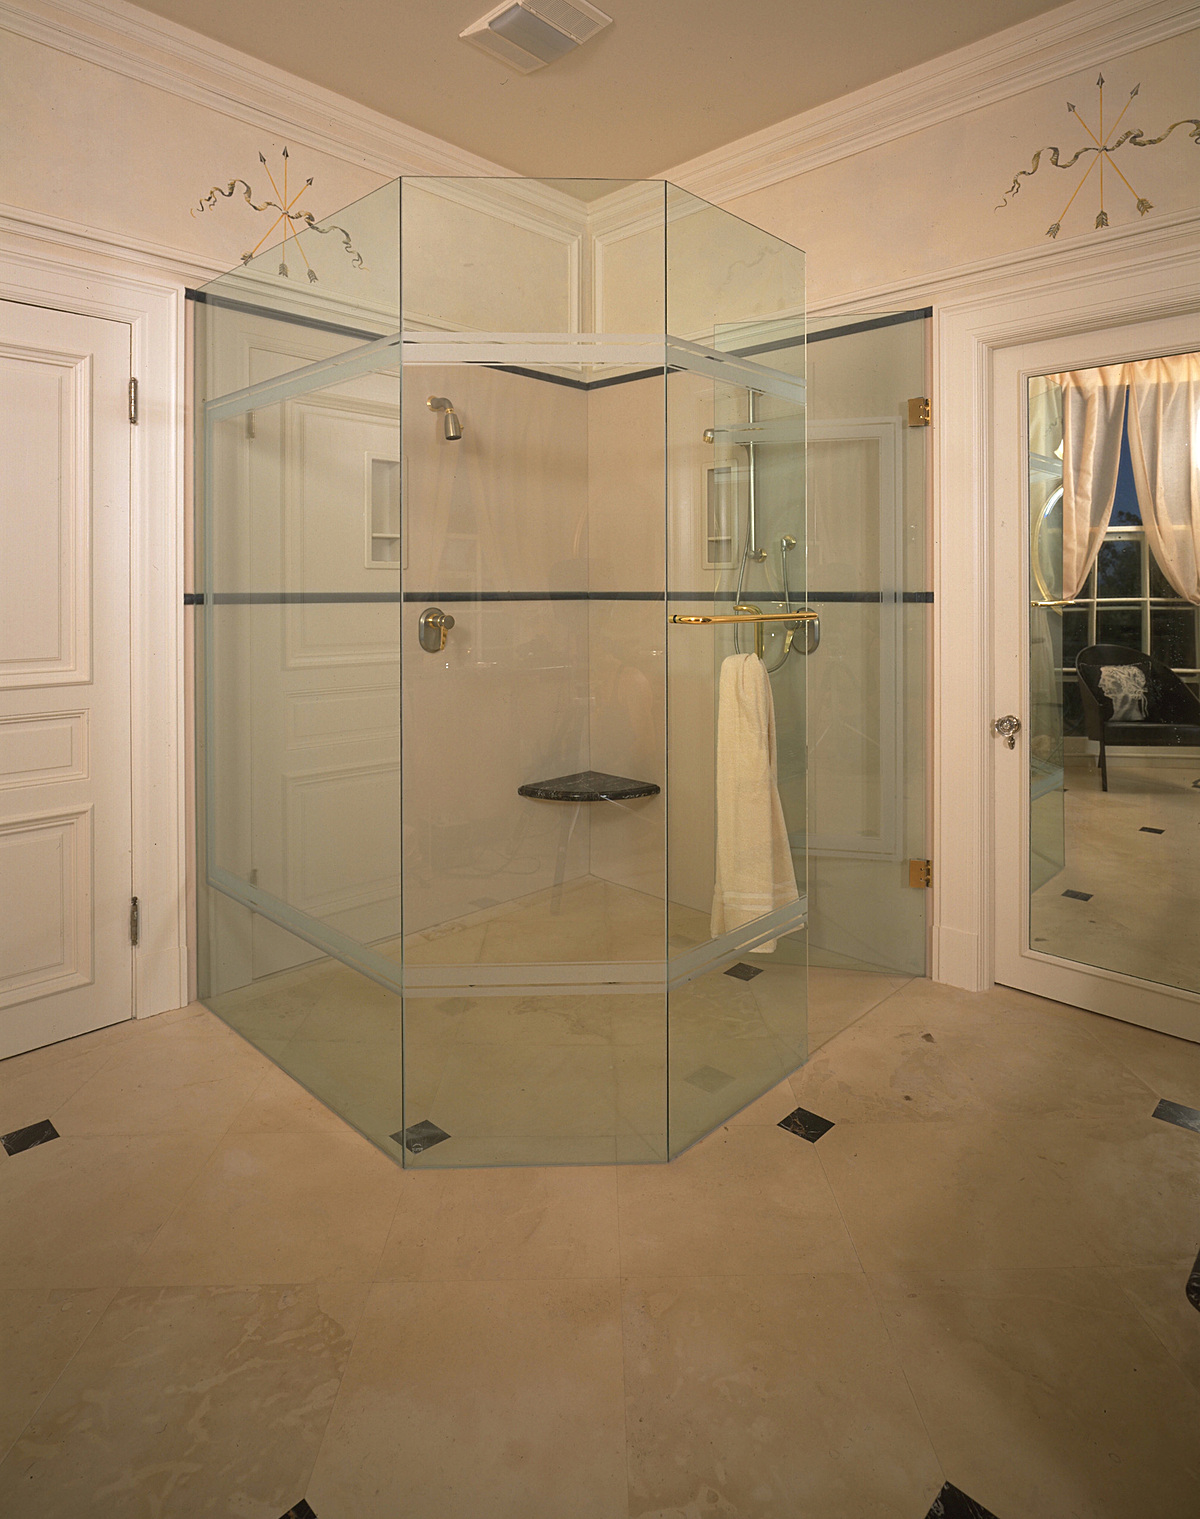 San Rafael. Villa Altura Pompeian. Shower for 2.